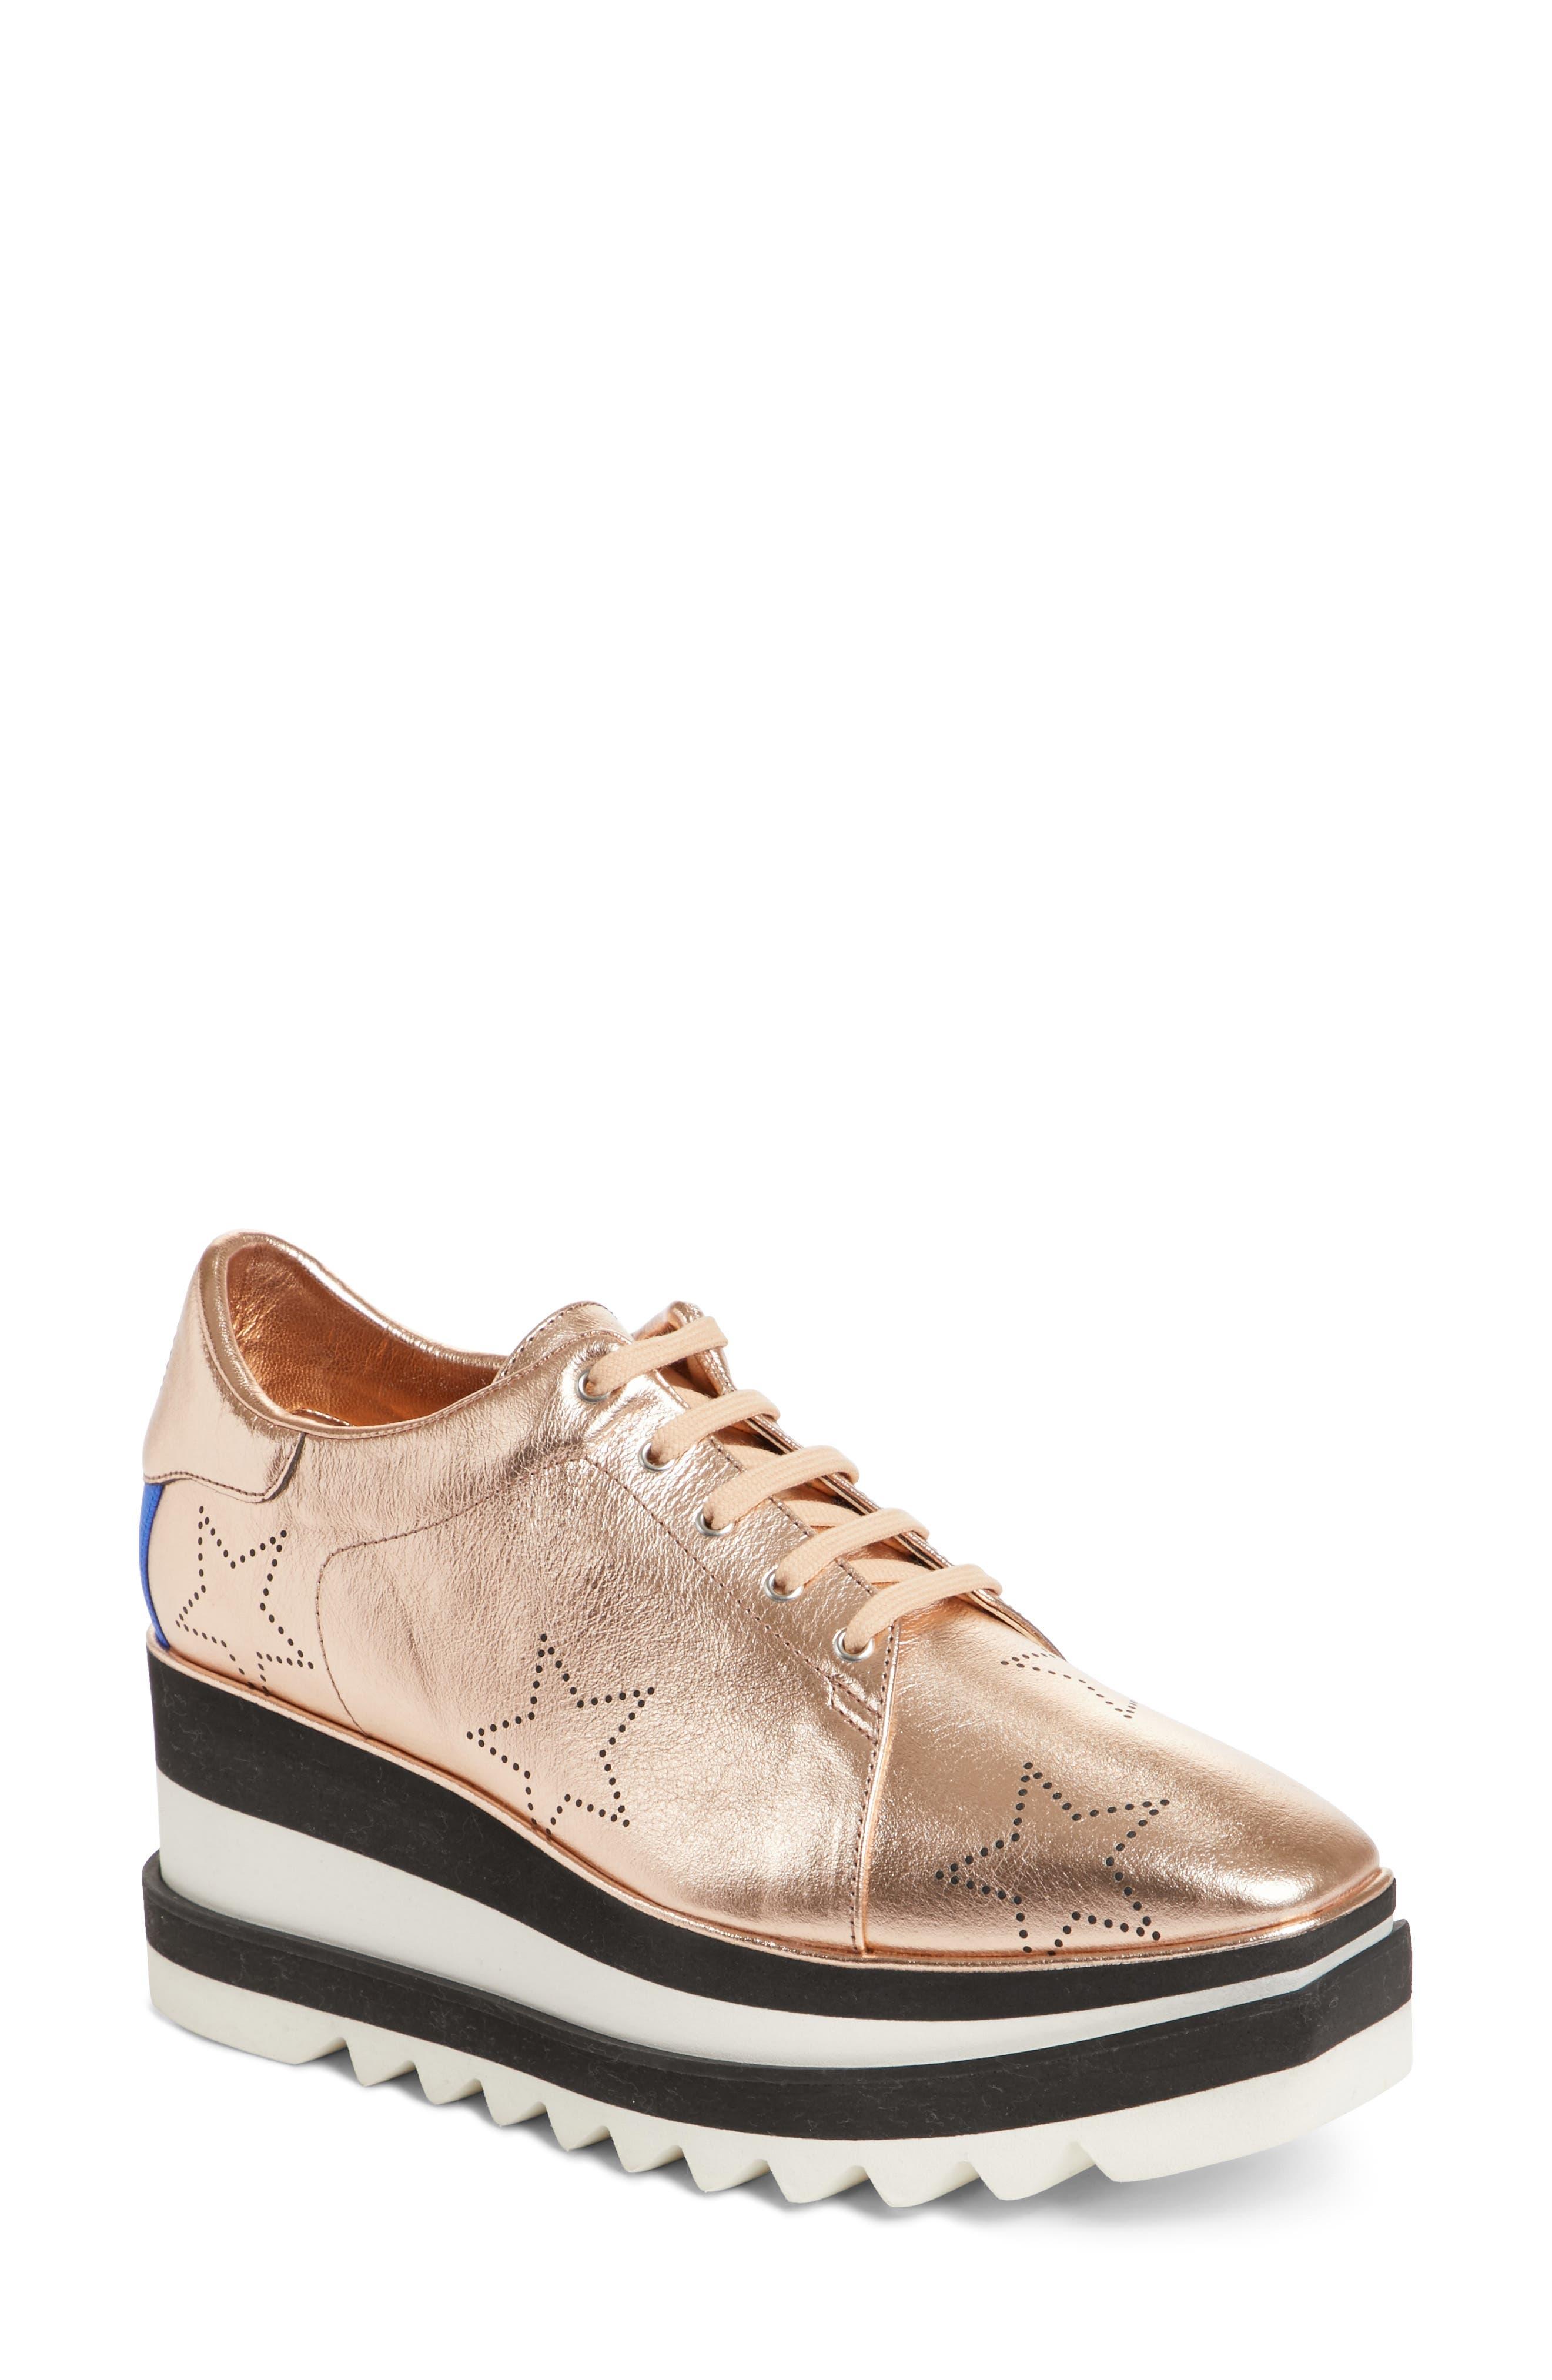 Alternate Image 1 Selected - Stella McCartney Elyse Platform Sneaker (Women)